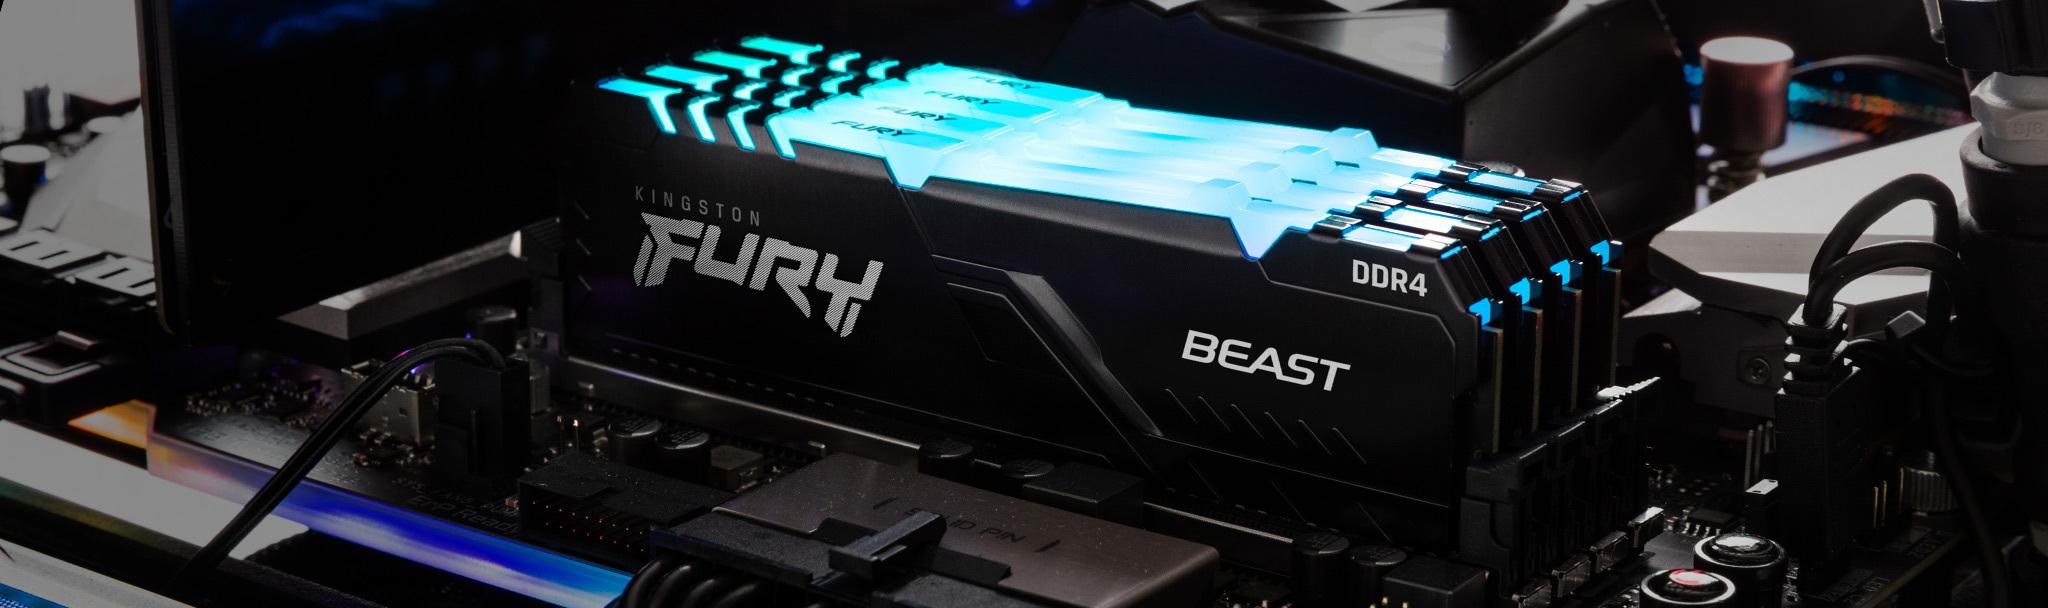 Оперативная память Kingston Fury Beast RGB DDR4-3200